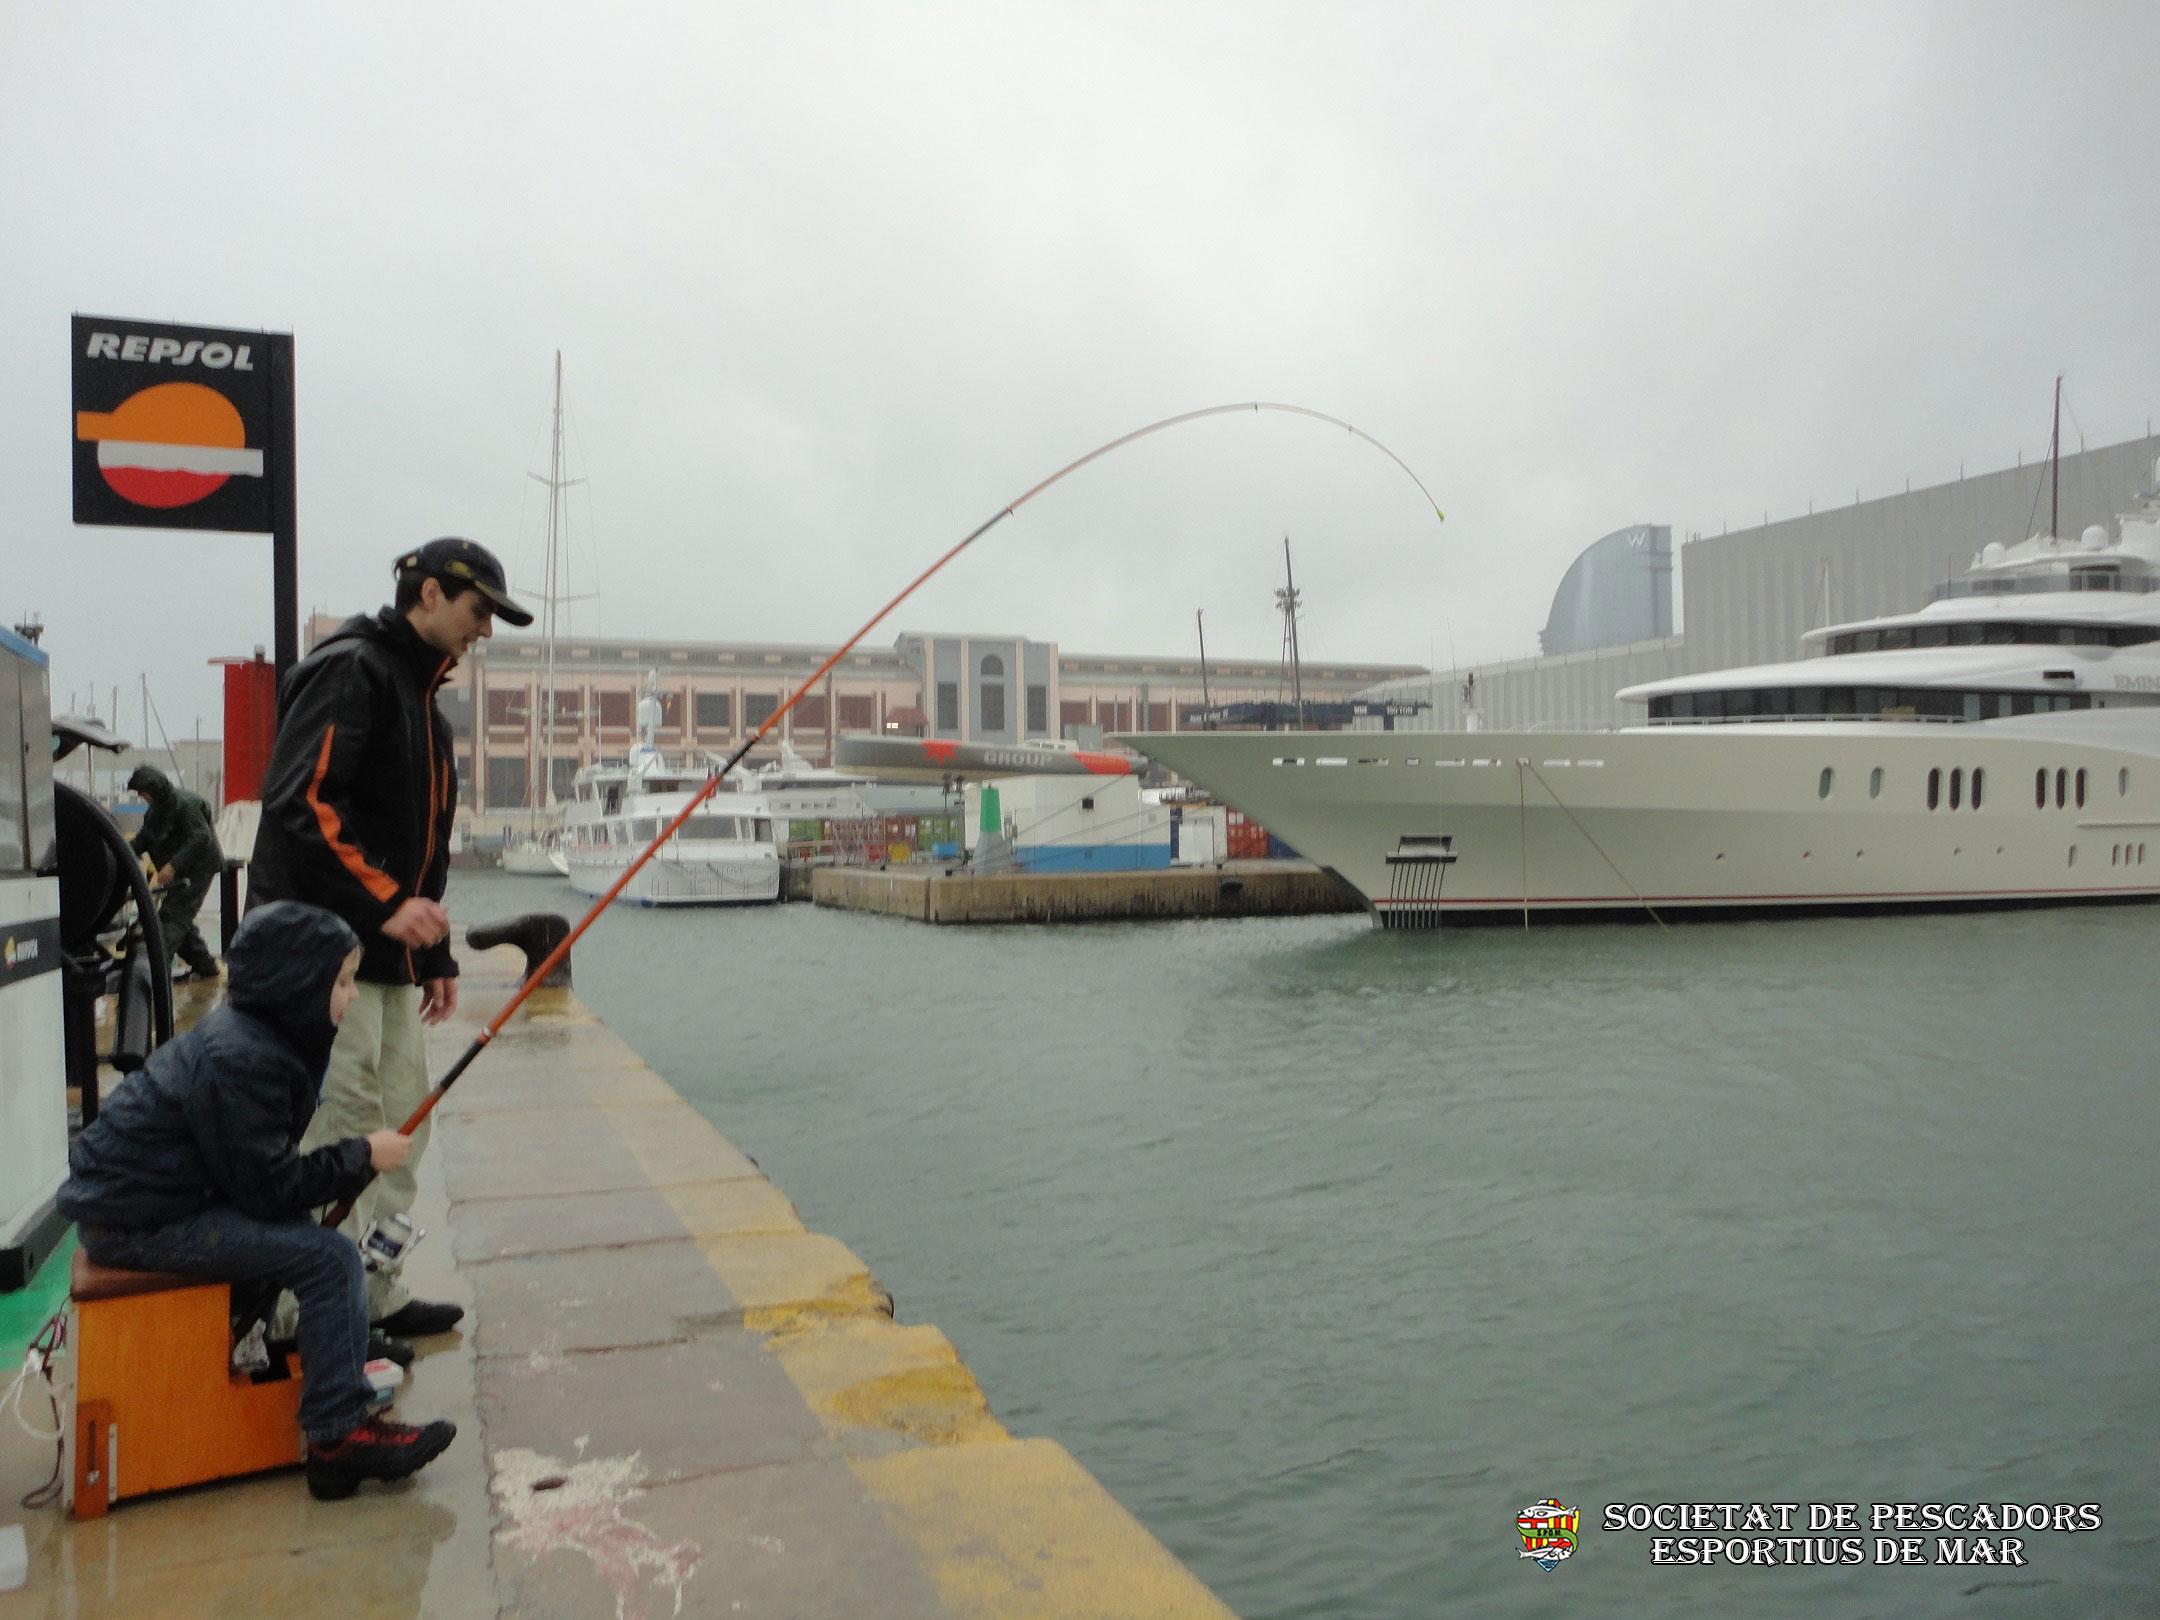 societat-de-pescadors-esportius-de-mar-barcelona-1117(www.societatpescadorsbarcelona